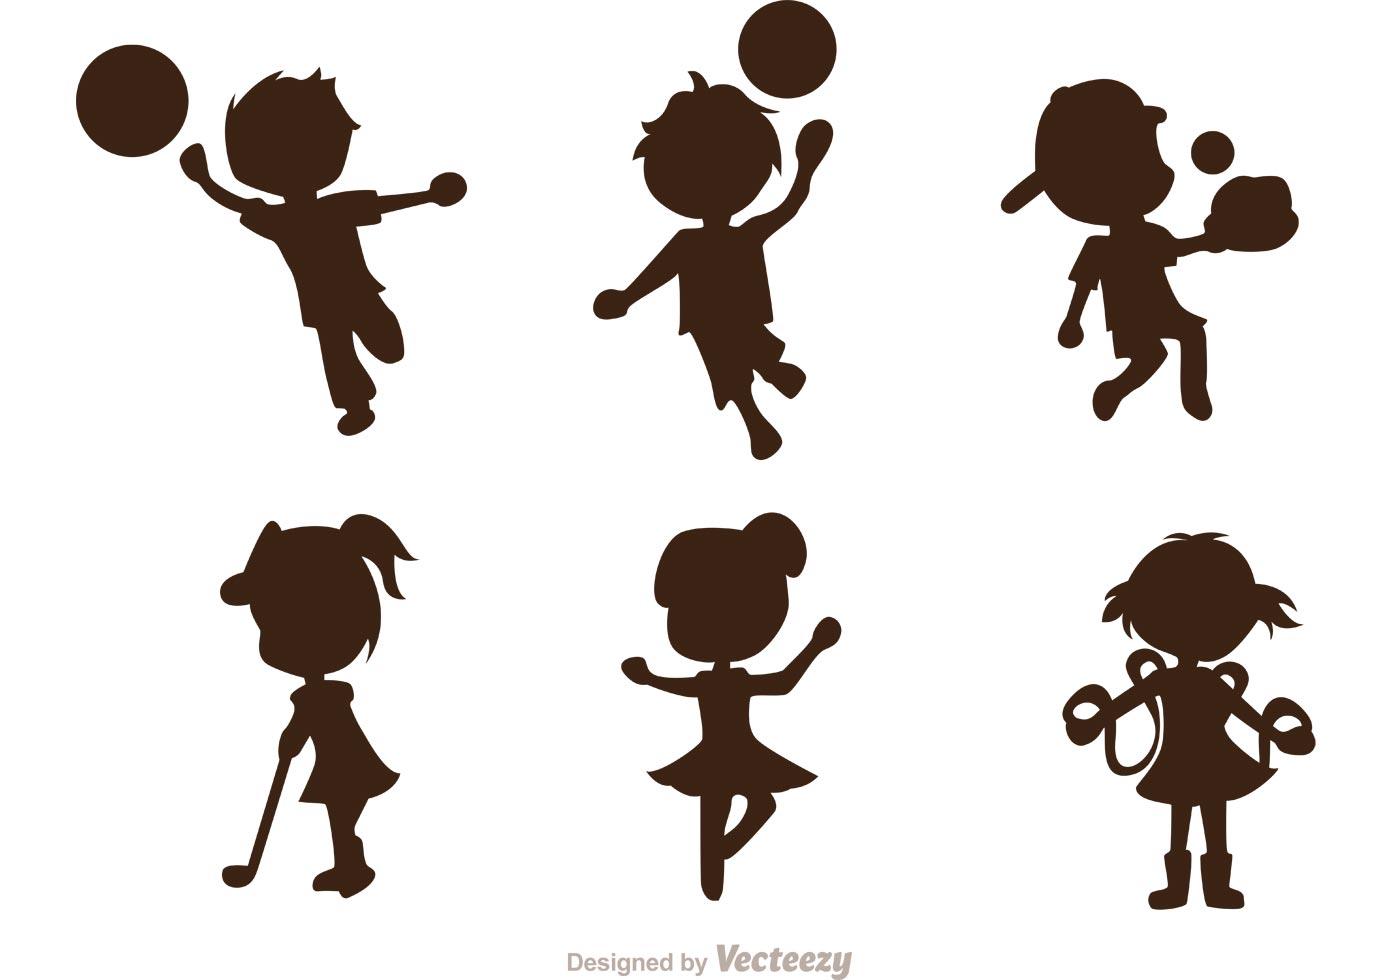 sporty kids vector pack download free vector art  stock school uniform clipart image wearing school uniform clipart